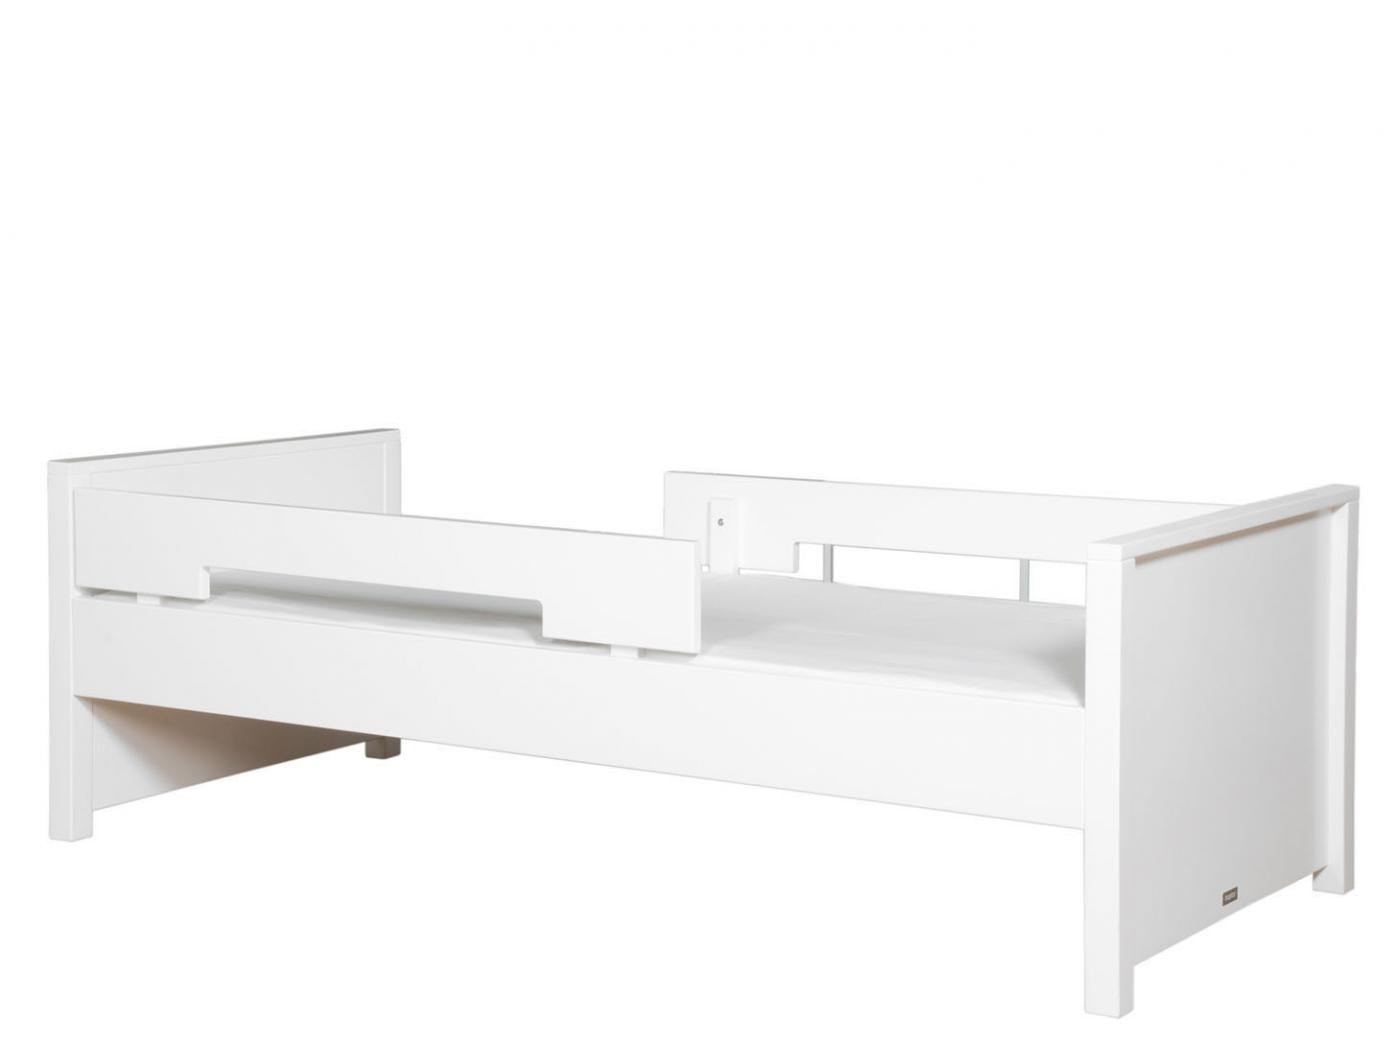 bopita lit junior 70x150 jonne blanc incl 2 barres de protection. Black Bedroom Furniture Sets. Home Design Ideas